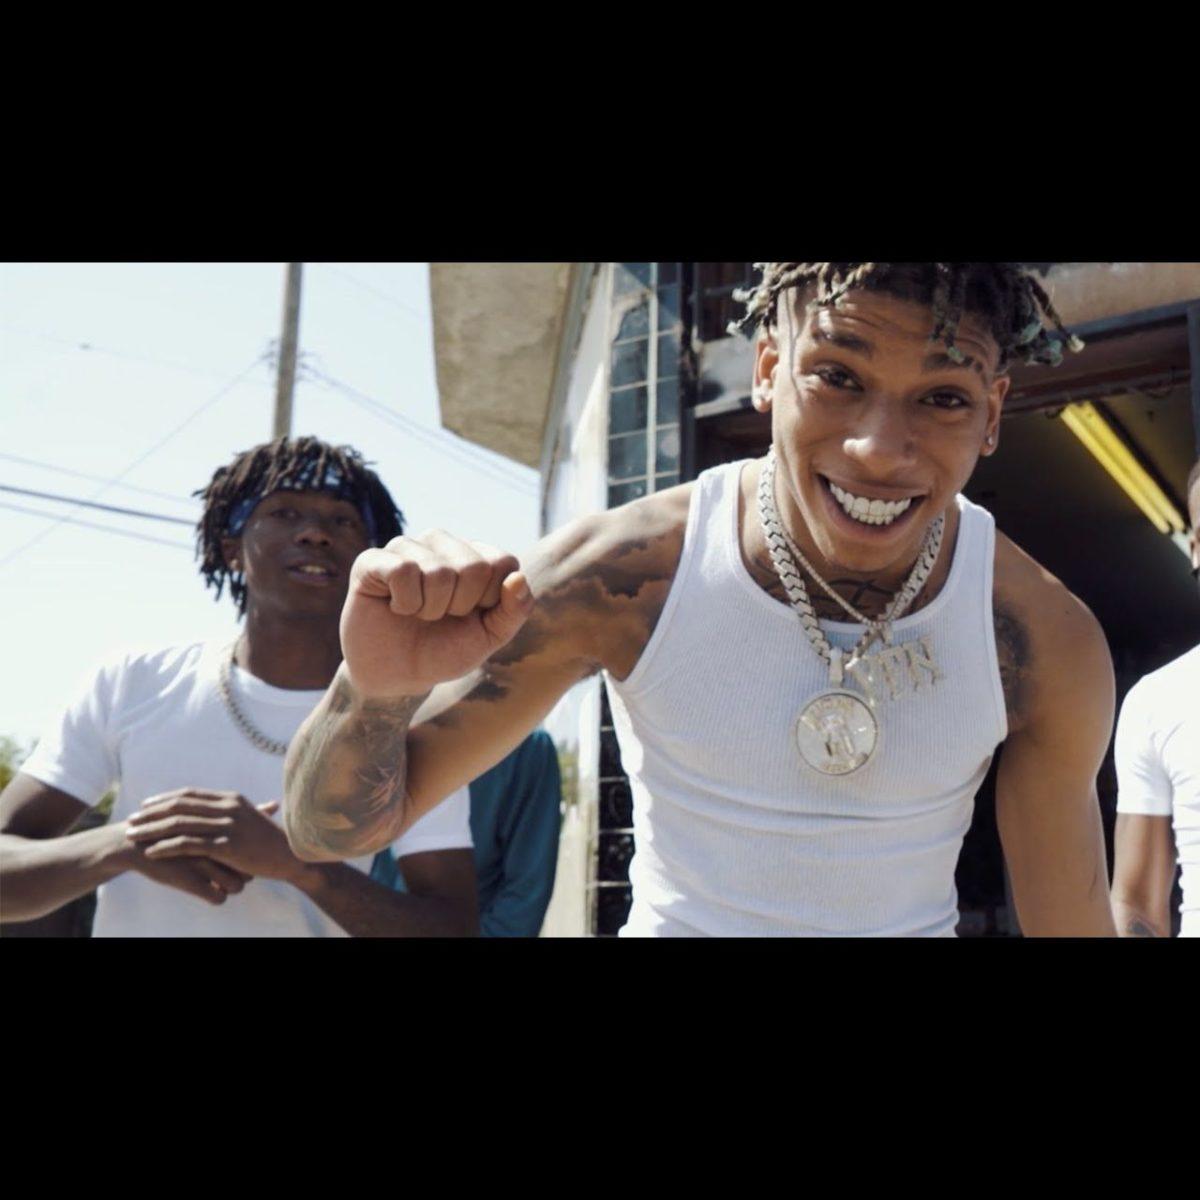 Lil Loaded - 6locc 6a6y (Remix) (ft. NLE Choppa) (Thumbnail)